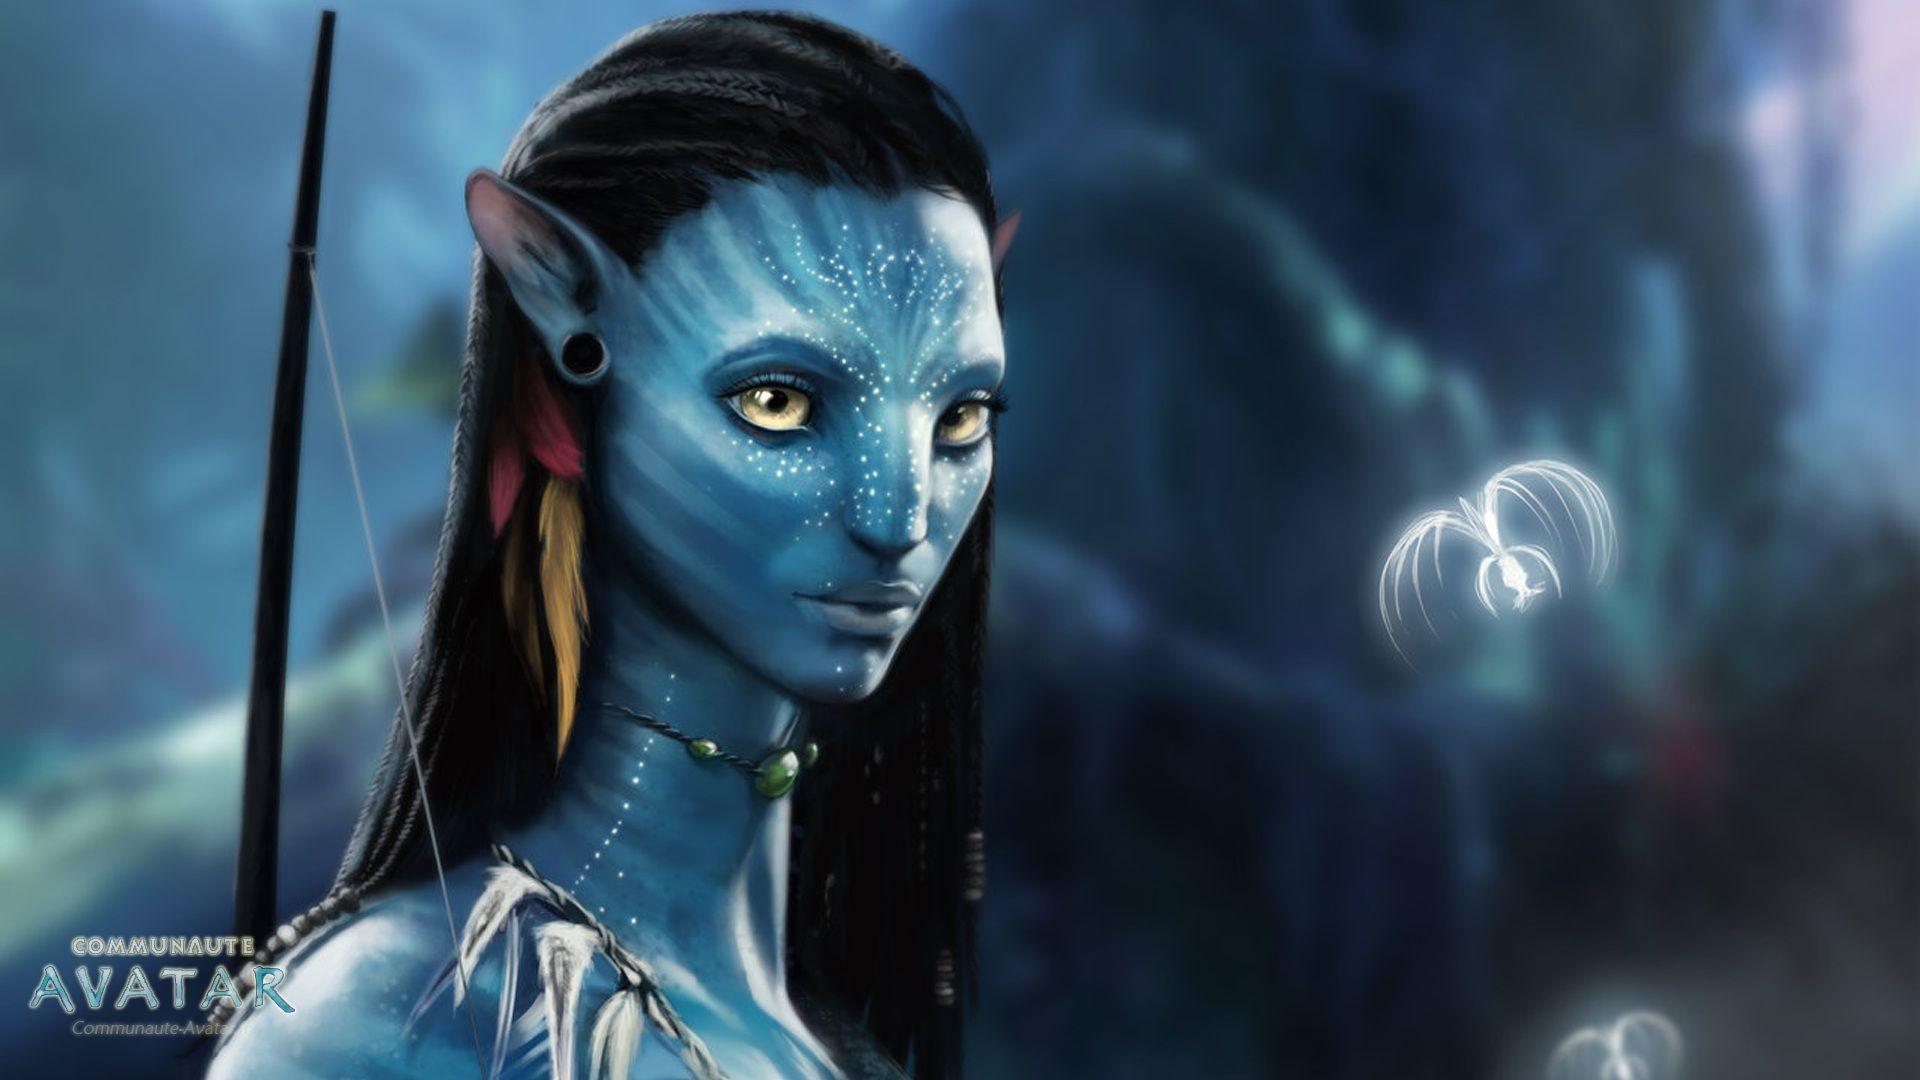 Avatar Avatar Movie Movie Wallpapers Avatar Picture